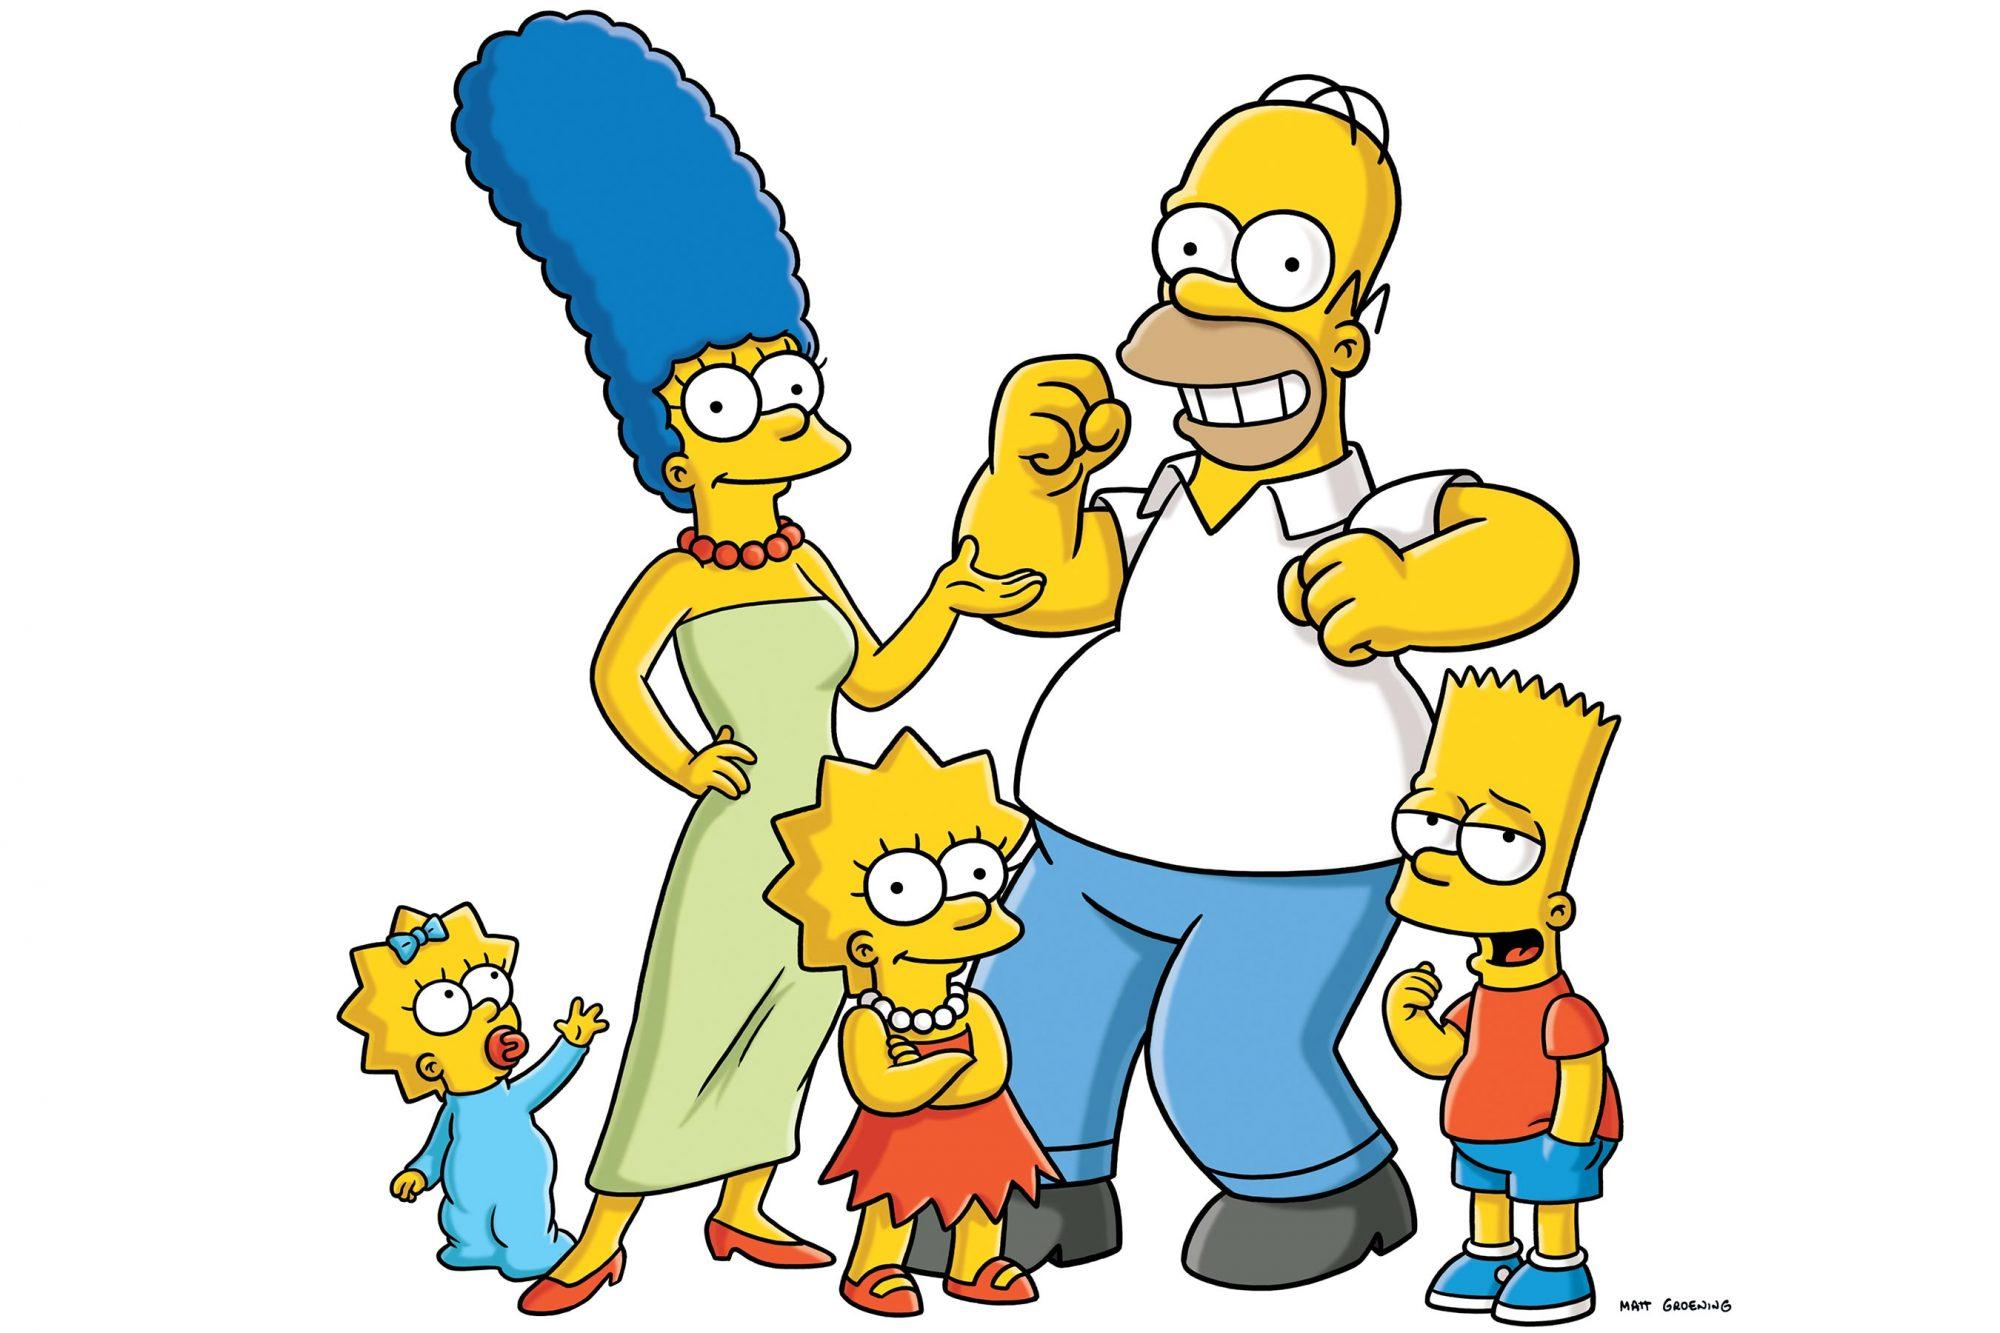 Simpsons_09_V2F